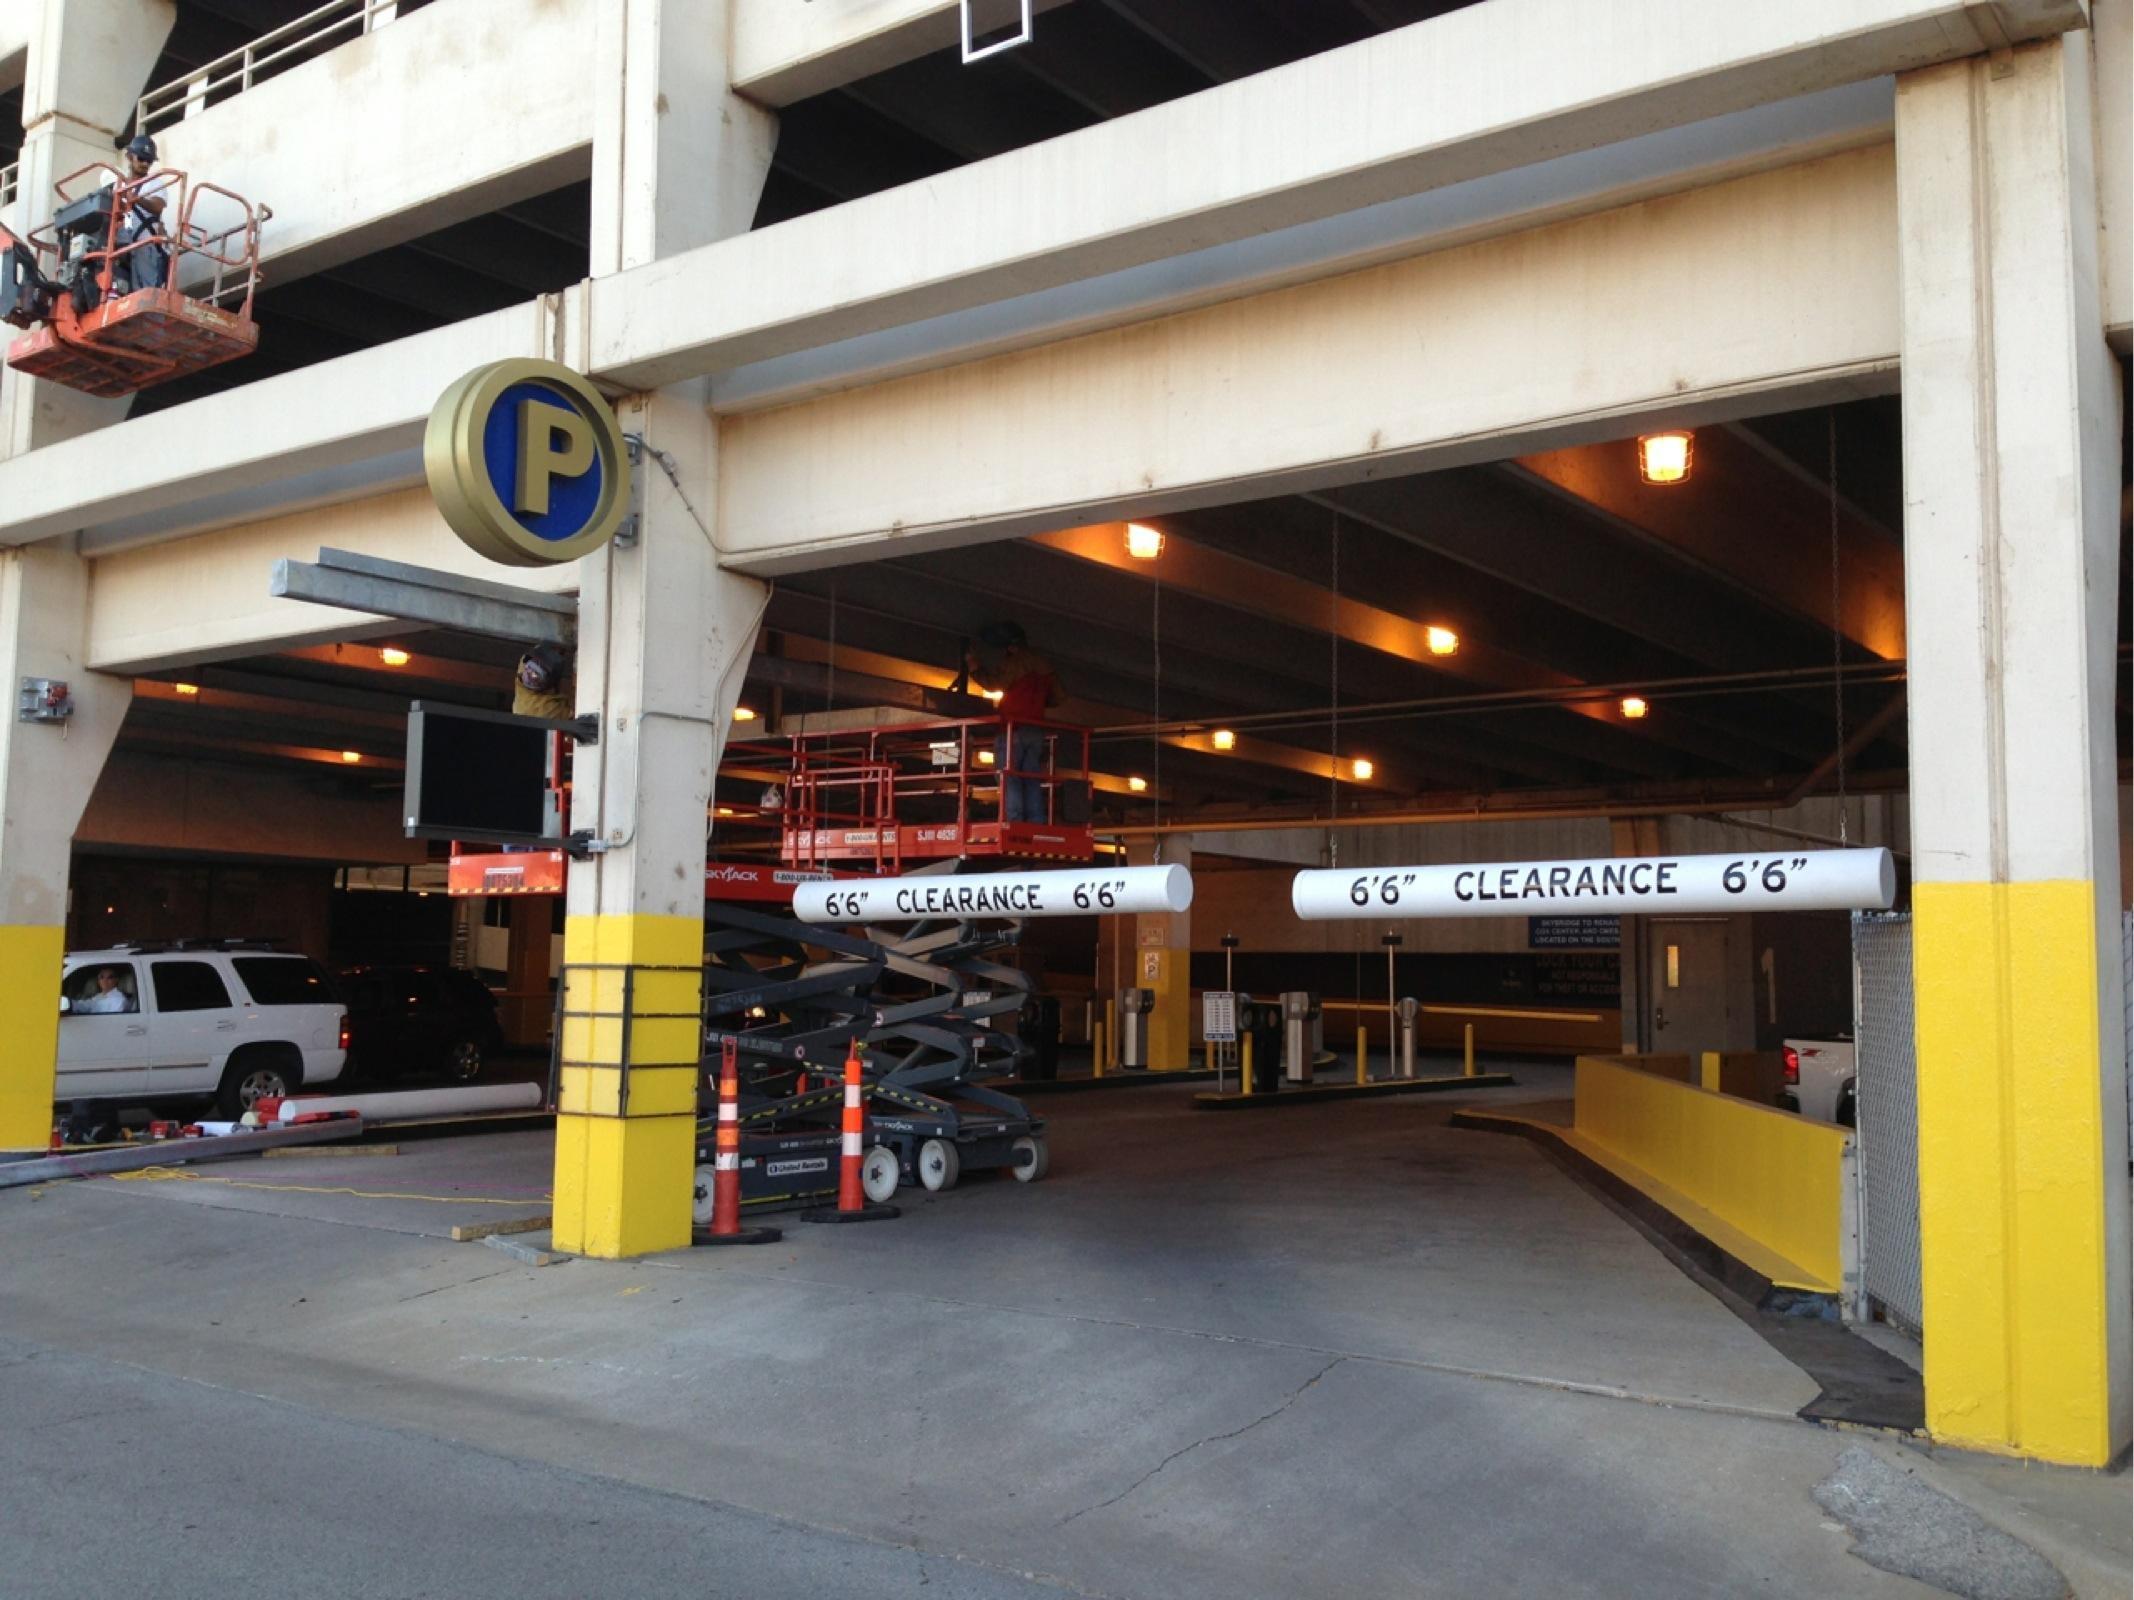 Santa Fe Garage Parking In Oklahoma City Parkme